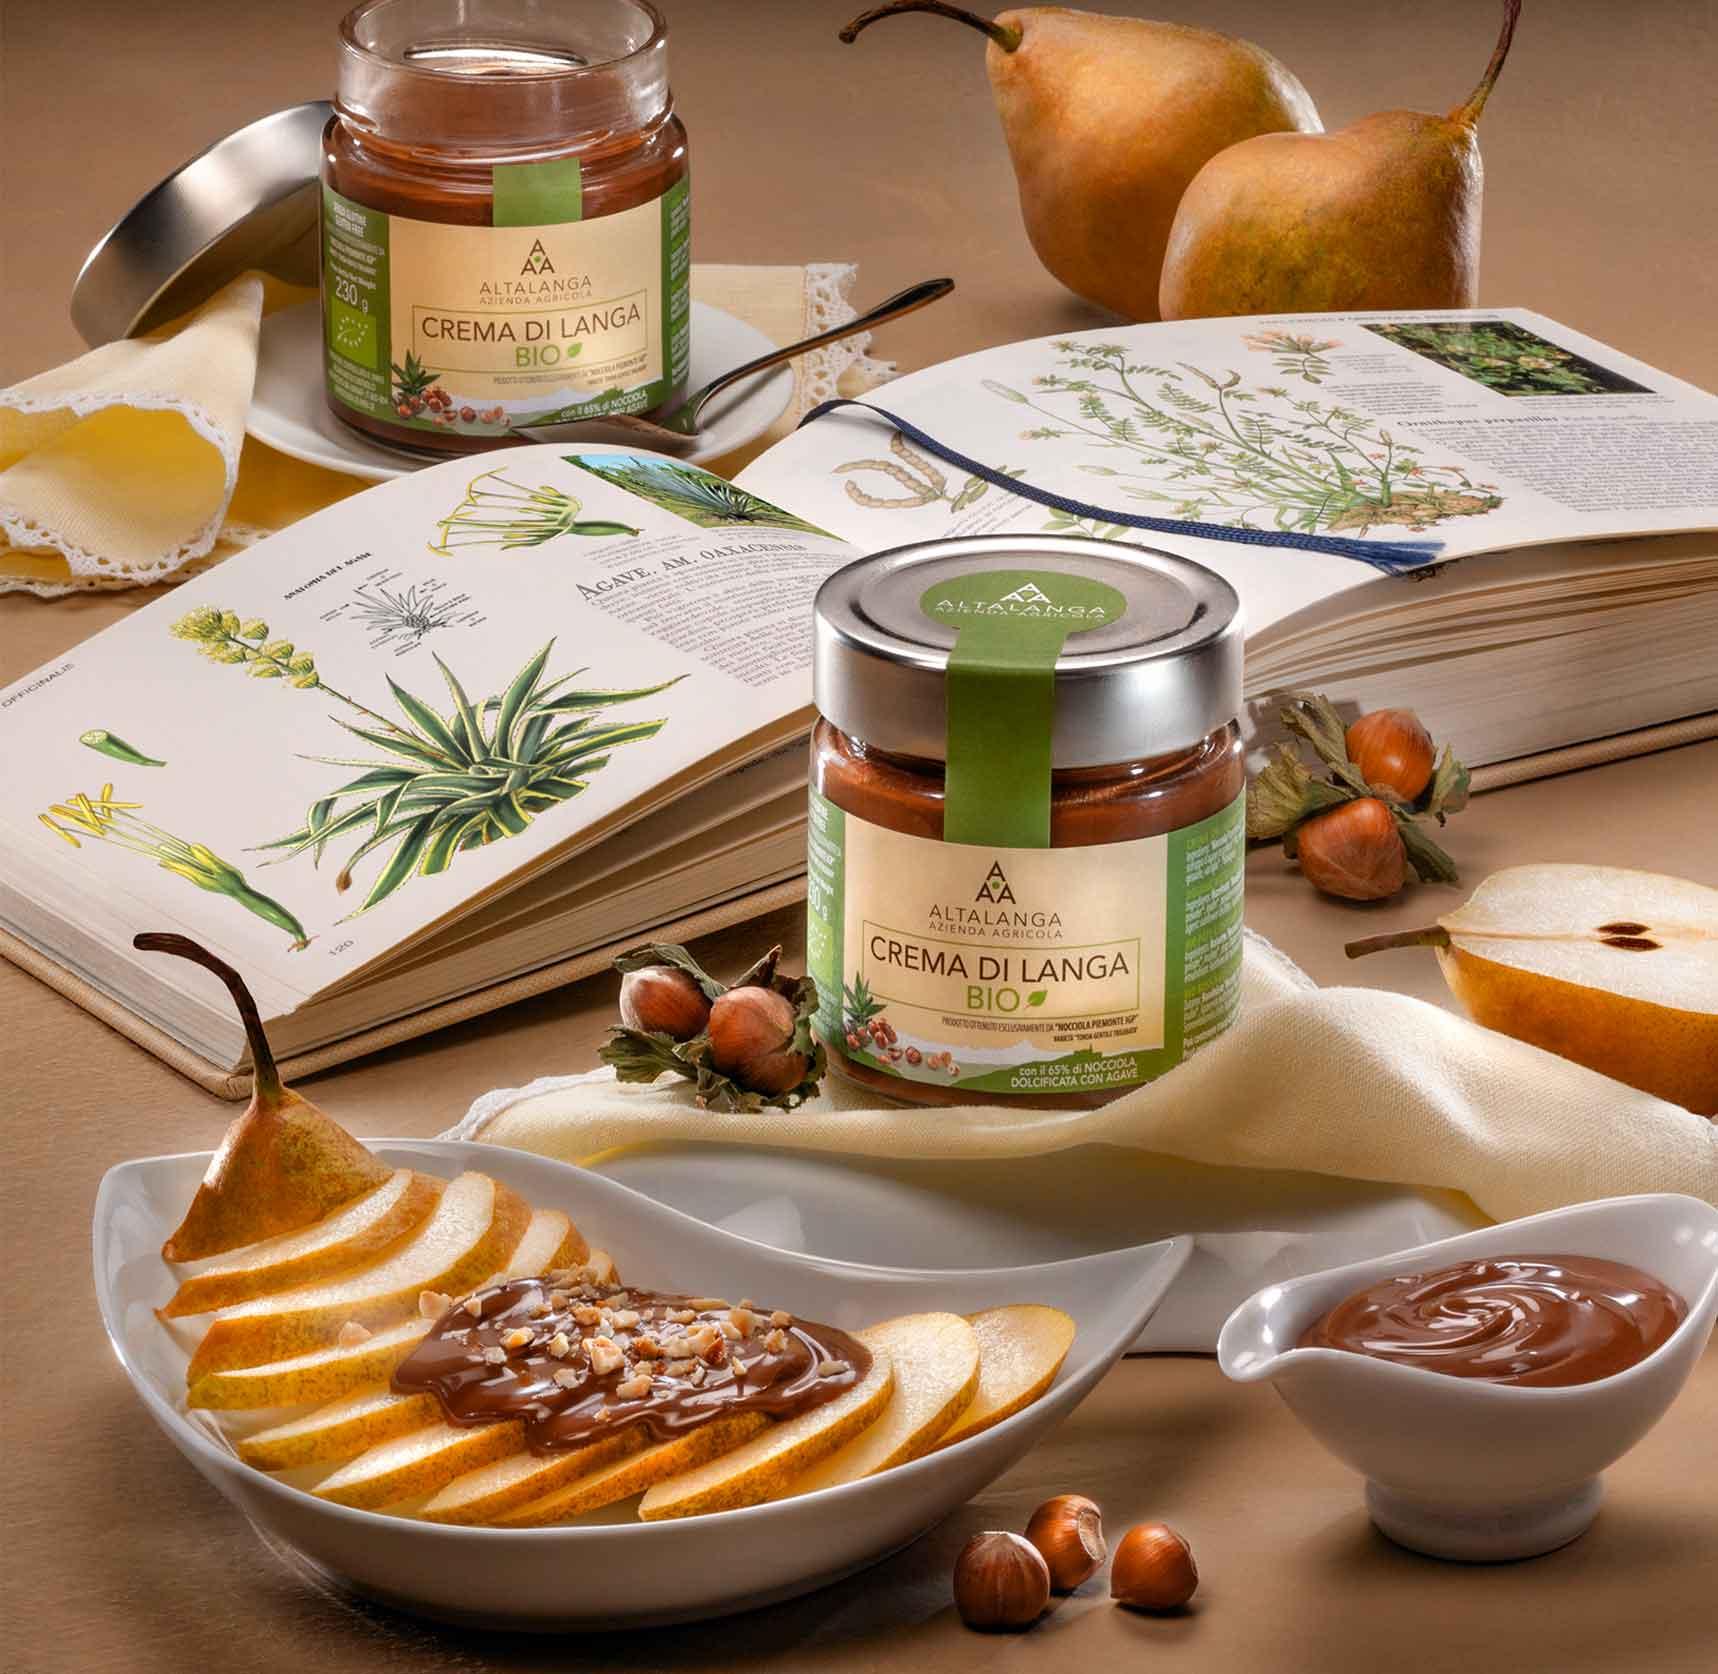 crema-nocciole-bio-langa-dolcificata-agave